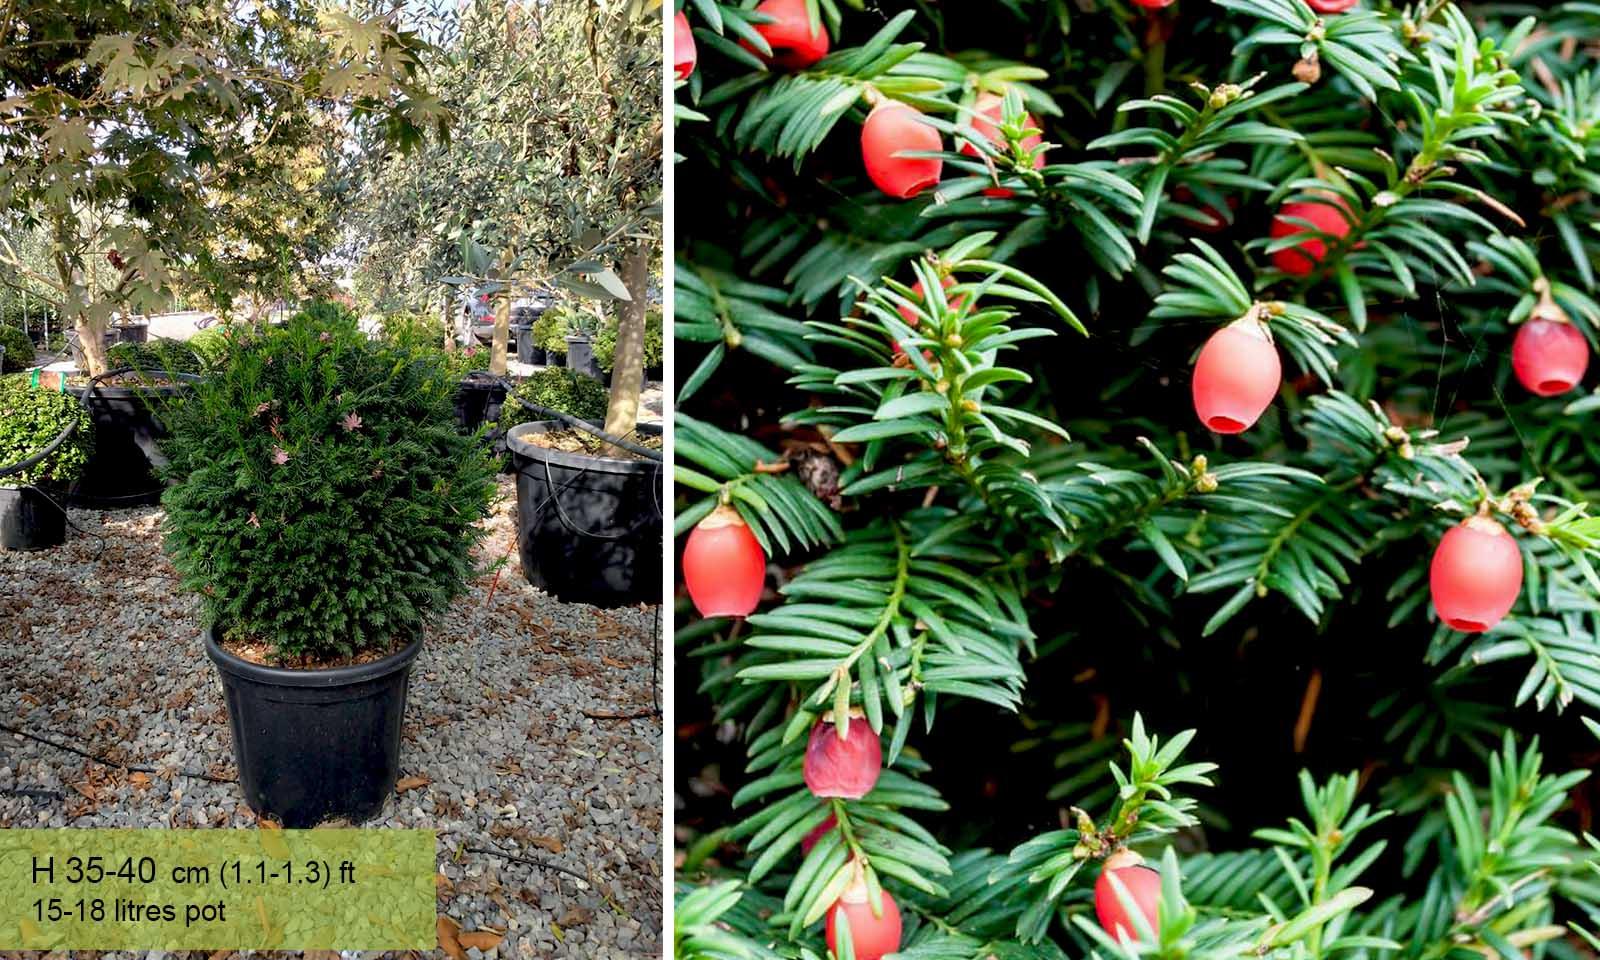 Taxus Baccata (English Yew) – Ball